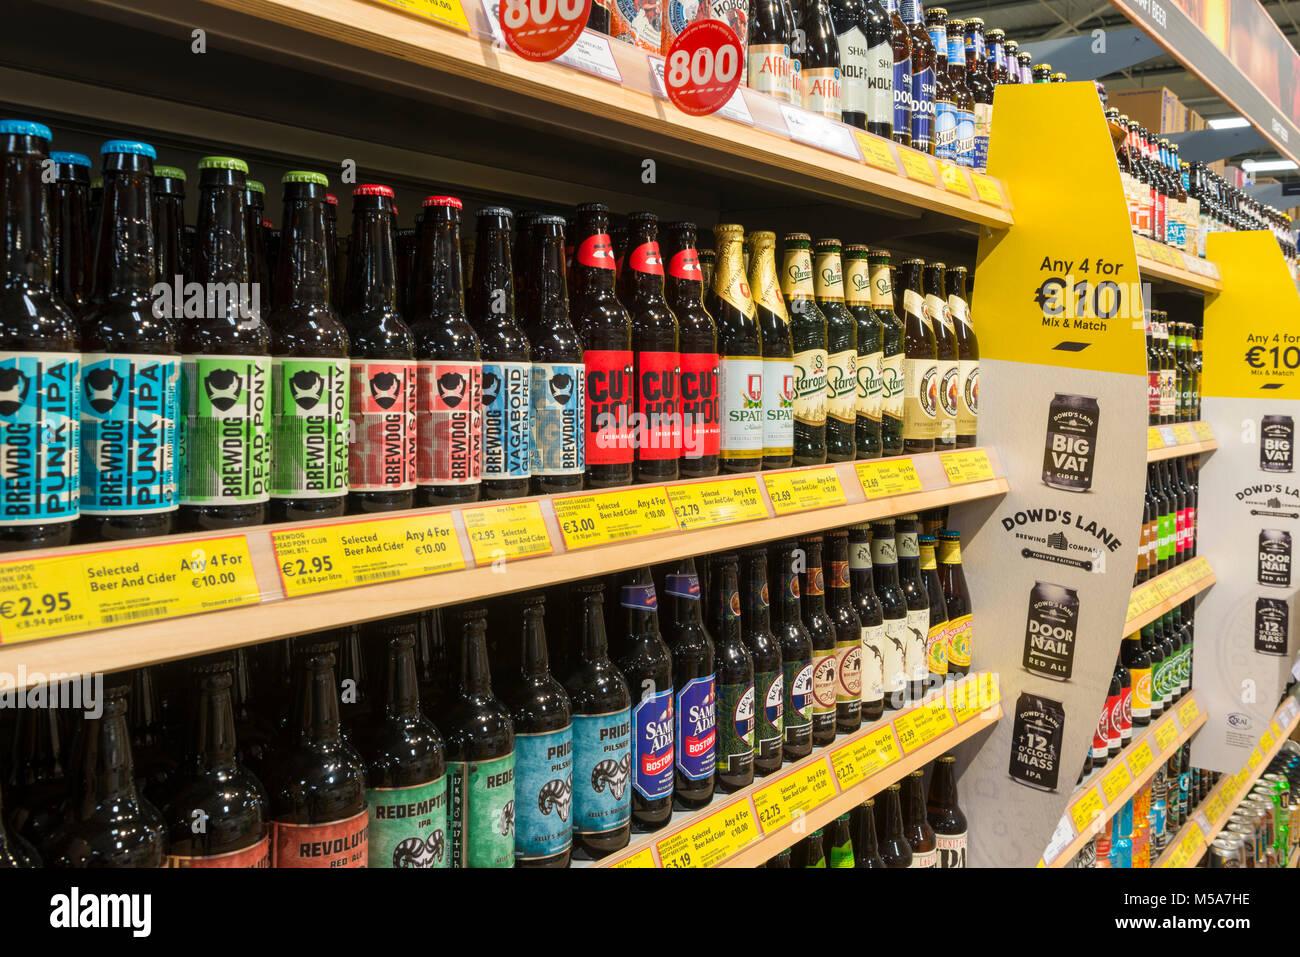 Craft beer on a supermarket shelf, Ireland - Stock Image